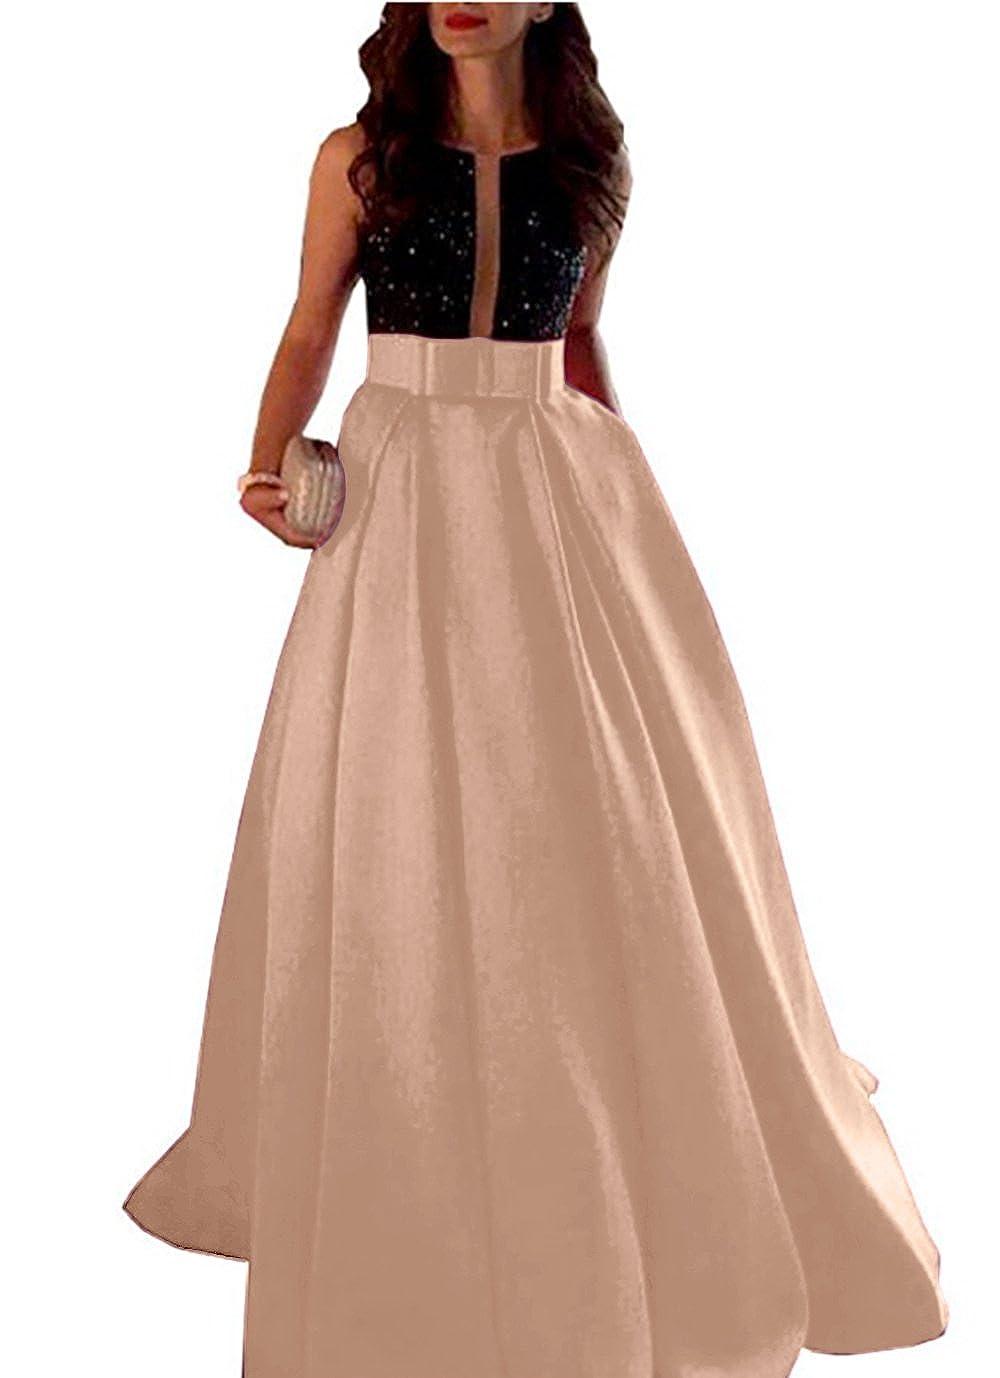 Champagne CL Bridal Women's Beaded Rhinestones Backless Formal Prom Dress Aline Evening Dress